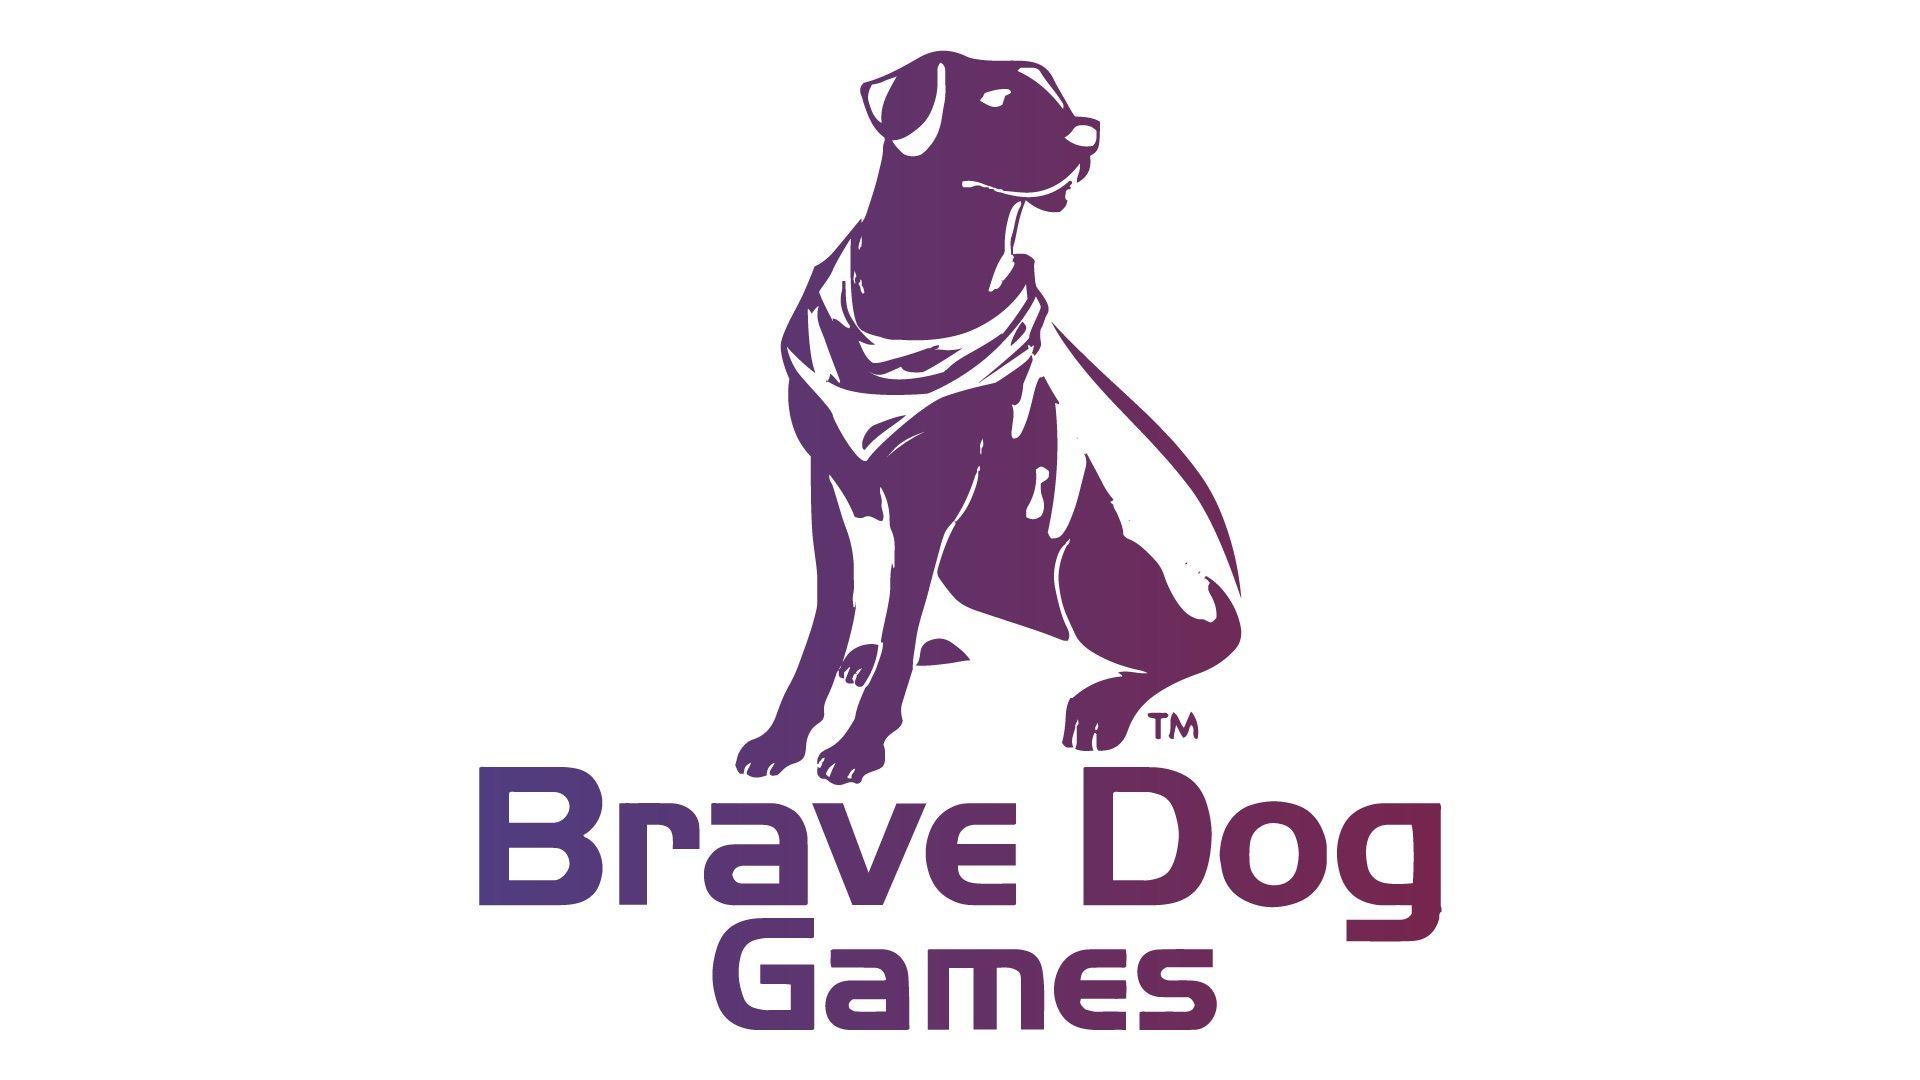 BraveDog Games